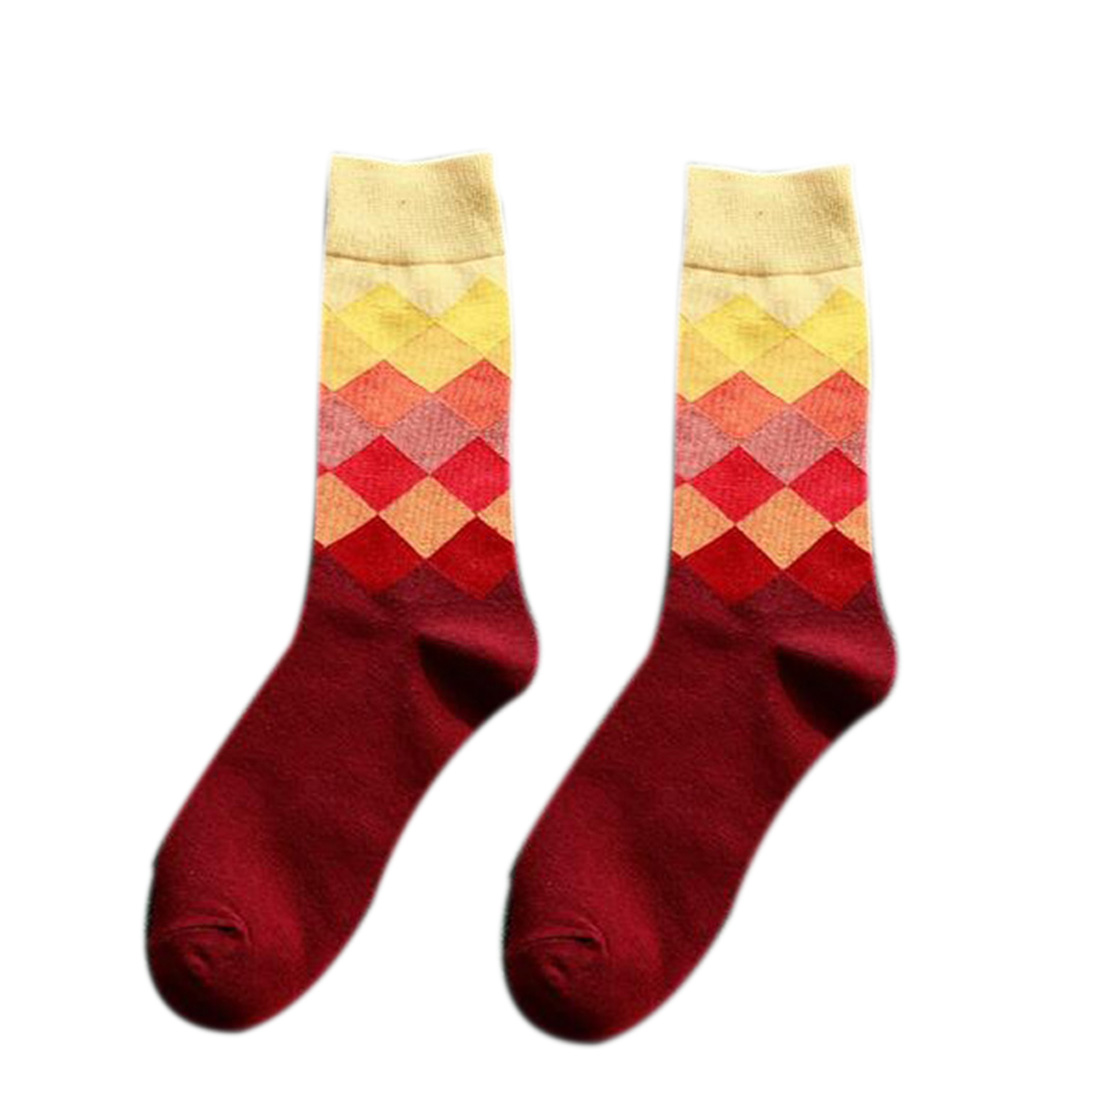 New Man SocksCombed Cotton Colorful Funny Socks Novelty Stripes Gradient Diamond Lattice Cross Grid Colored Diamond Men 39 s Socks in Men 39 s Socks from Underwear amp Sleepwears